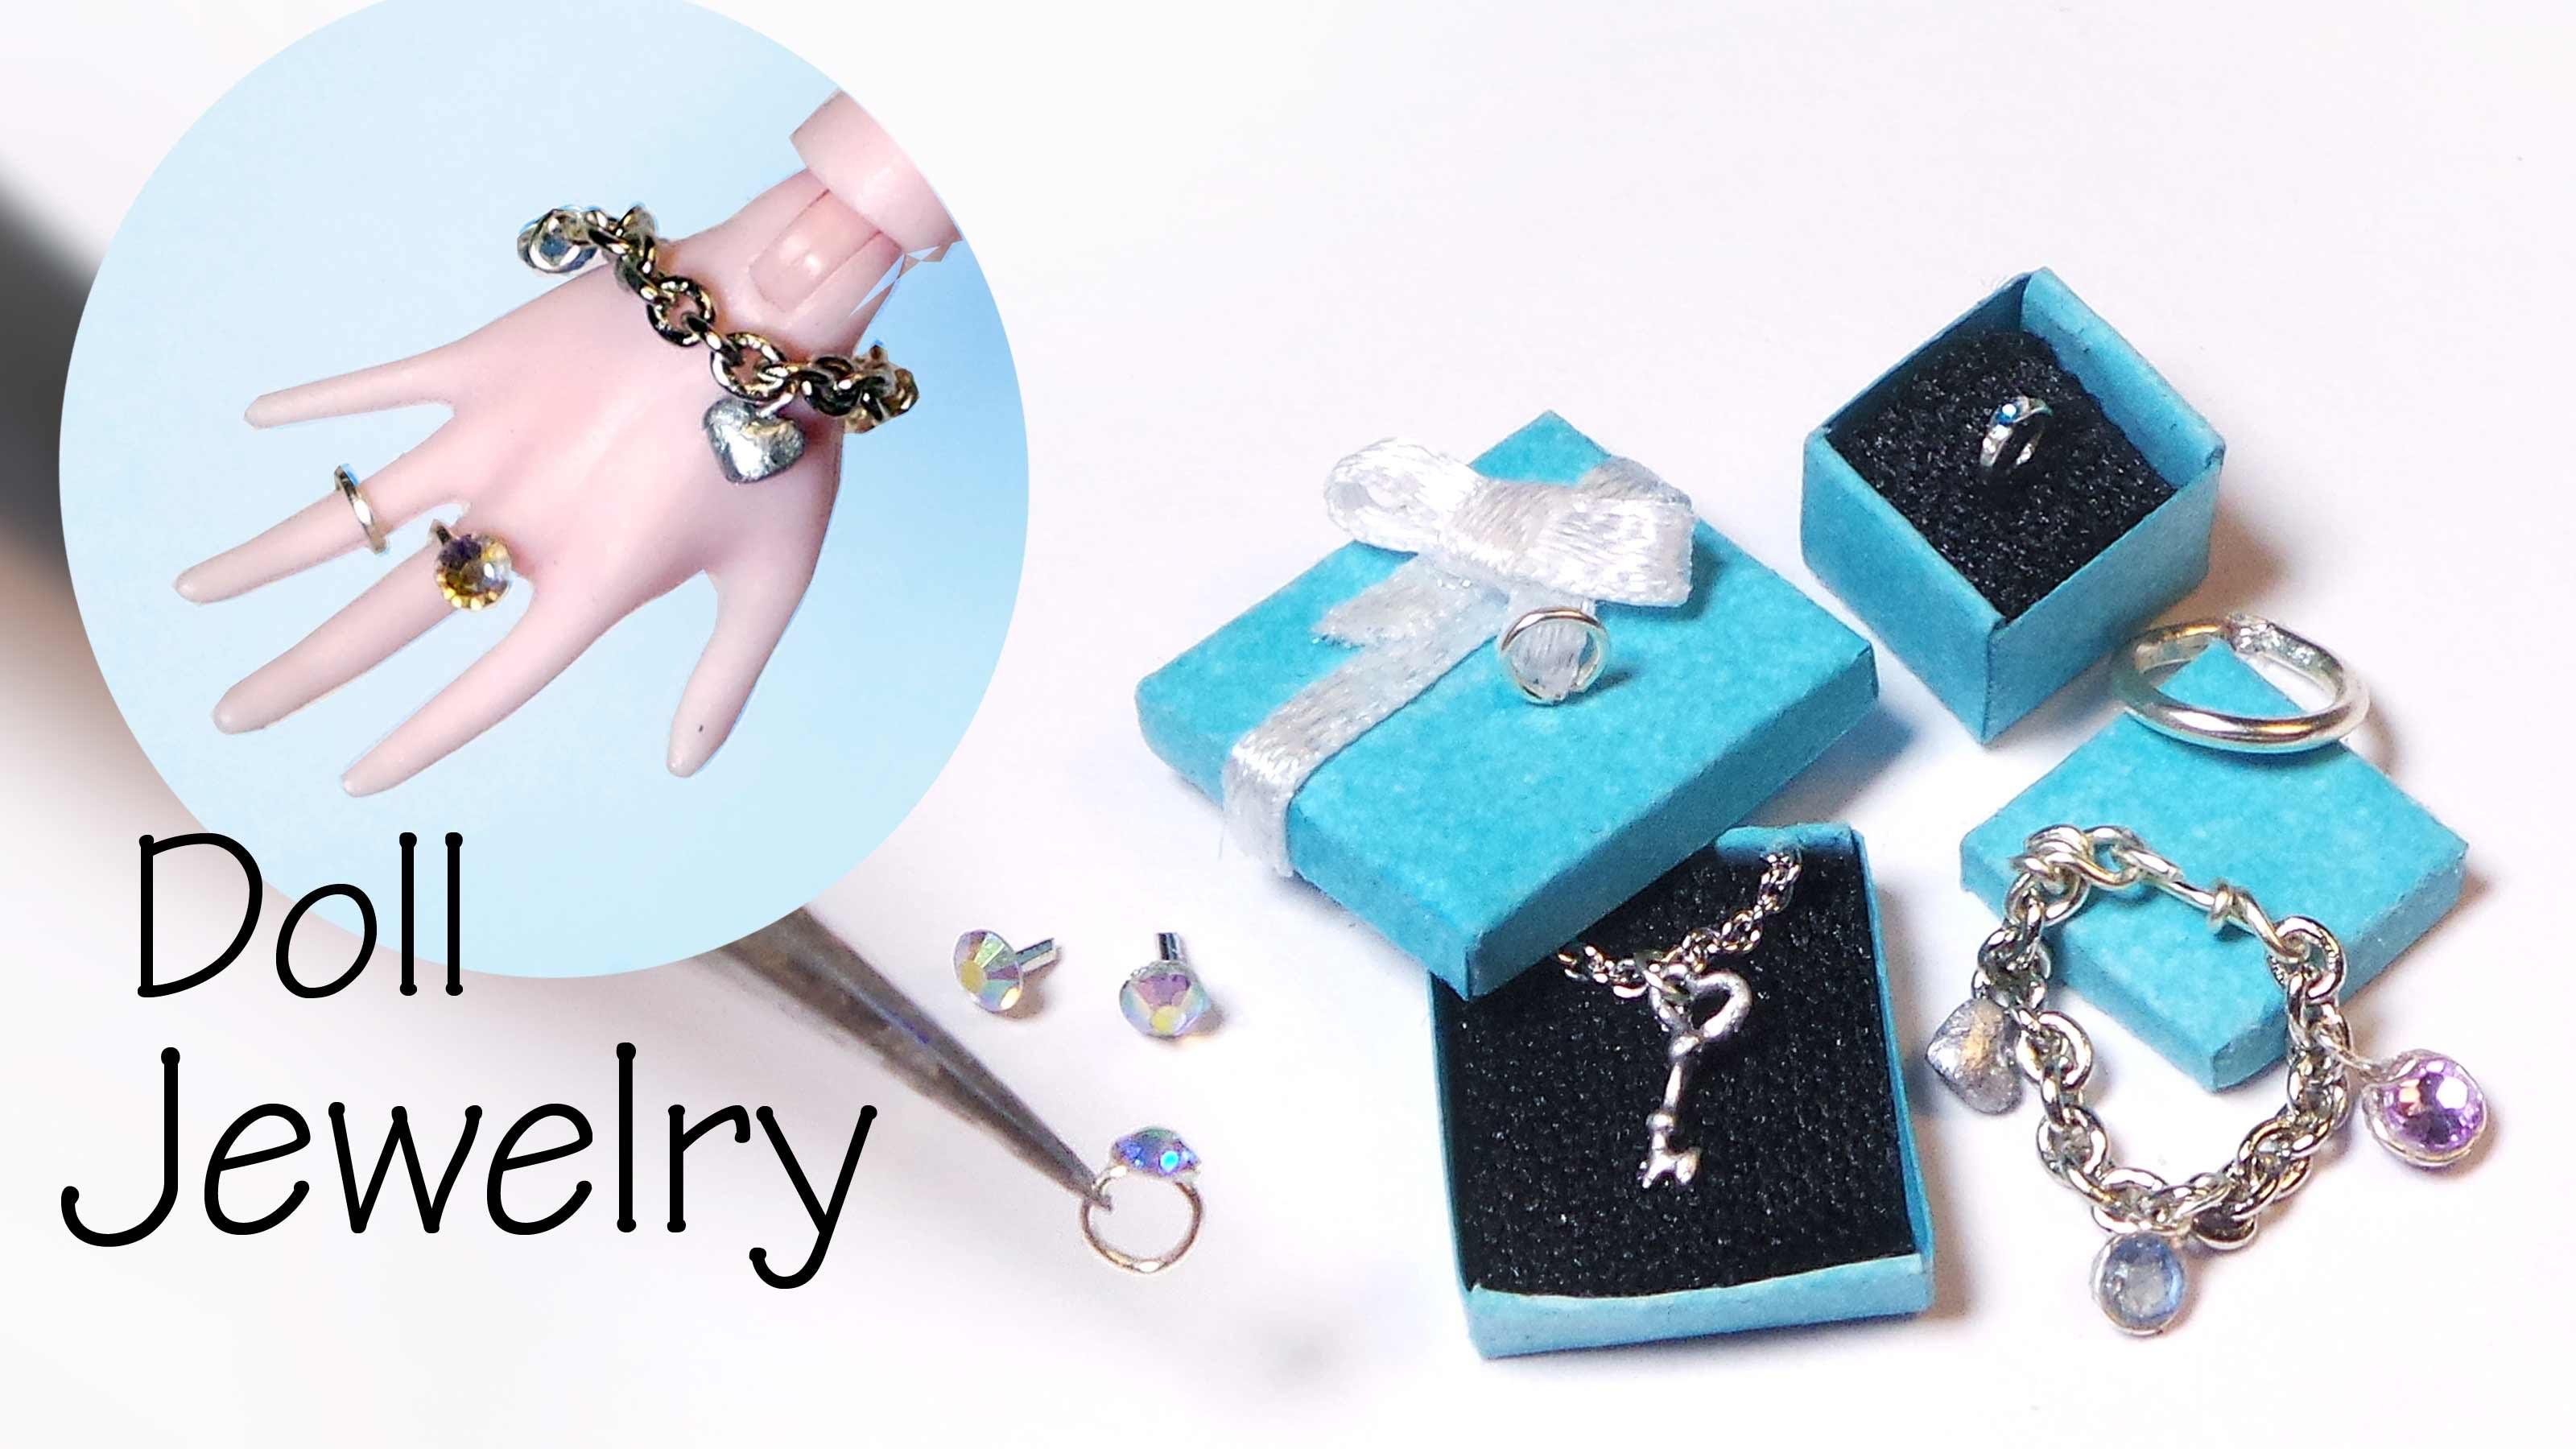 Easy Miniature Jewelry Tutorial; Charm Bracelet, Necklace, Rings, Earrings